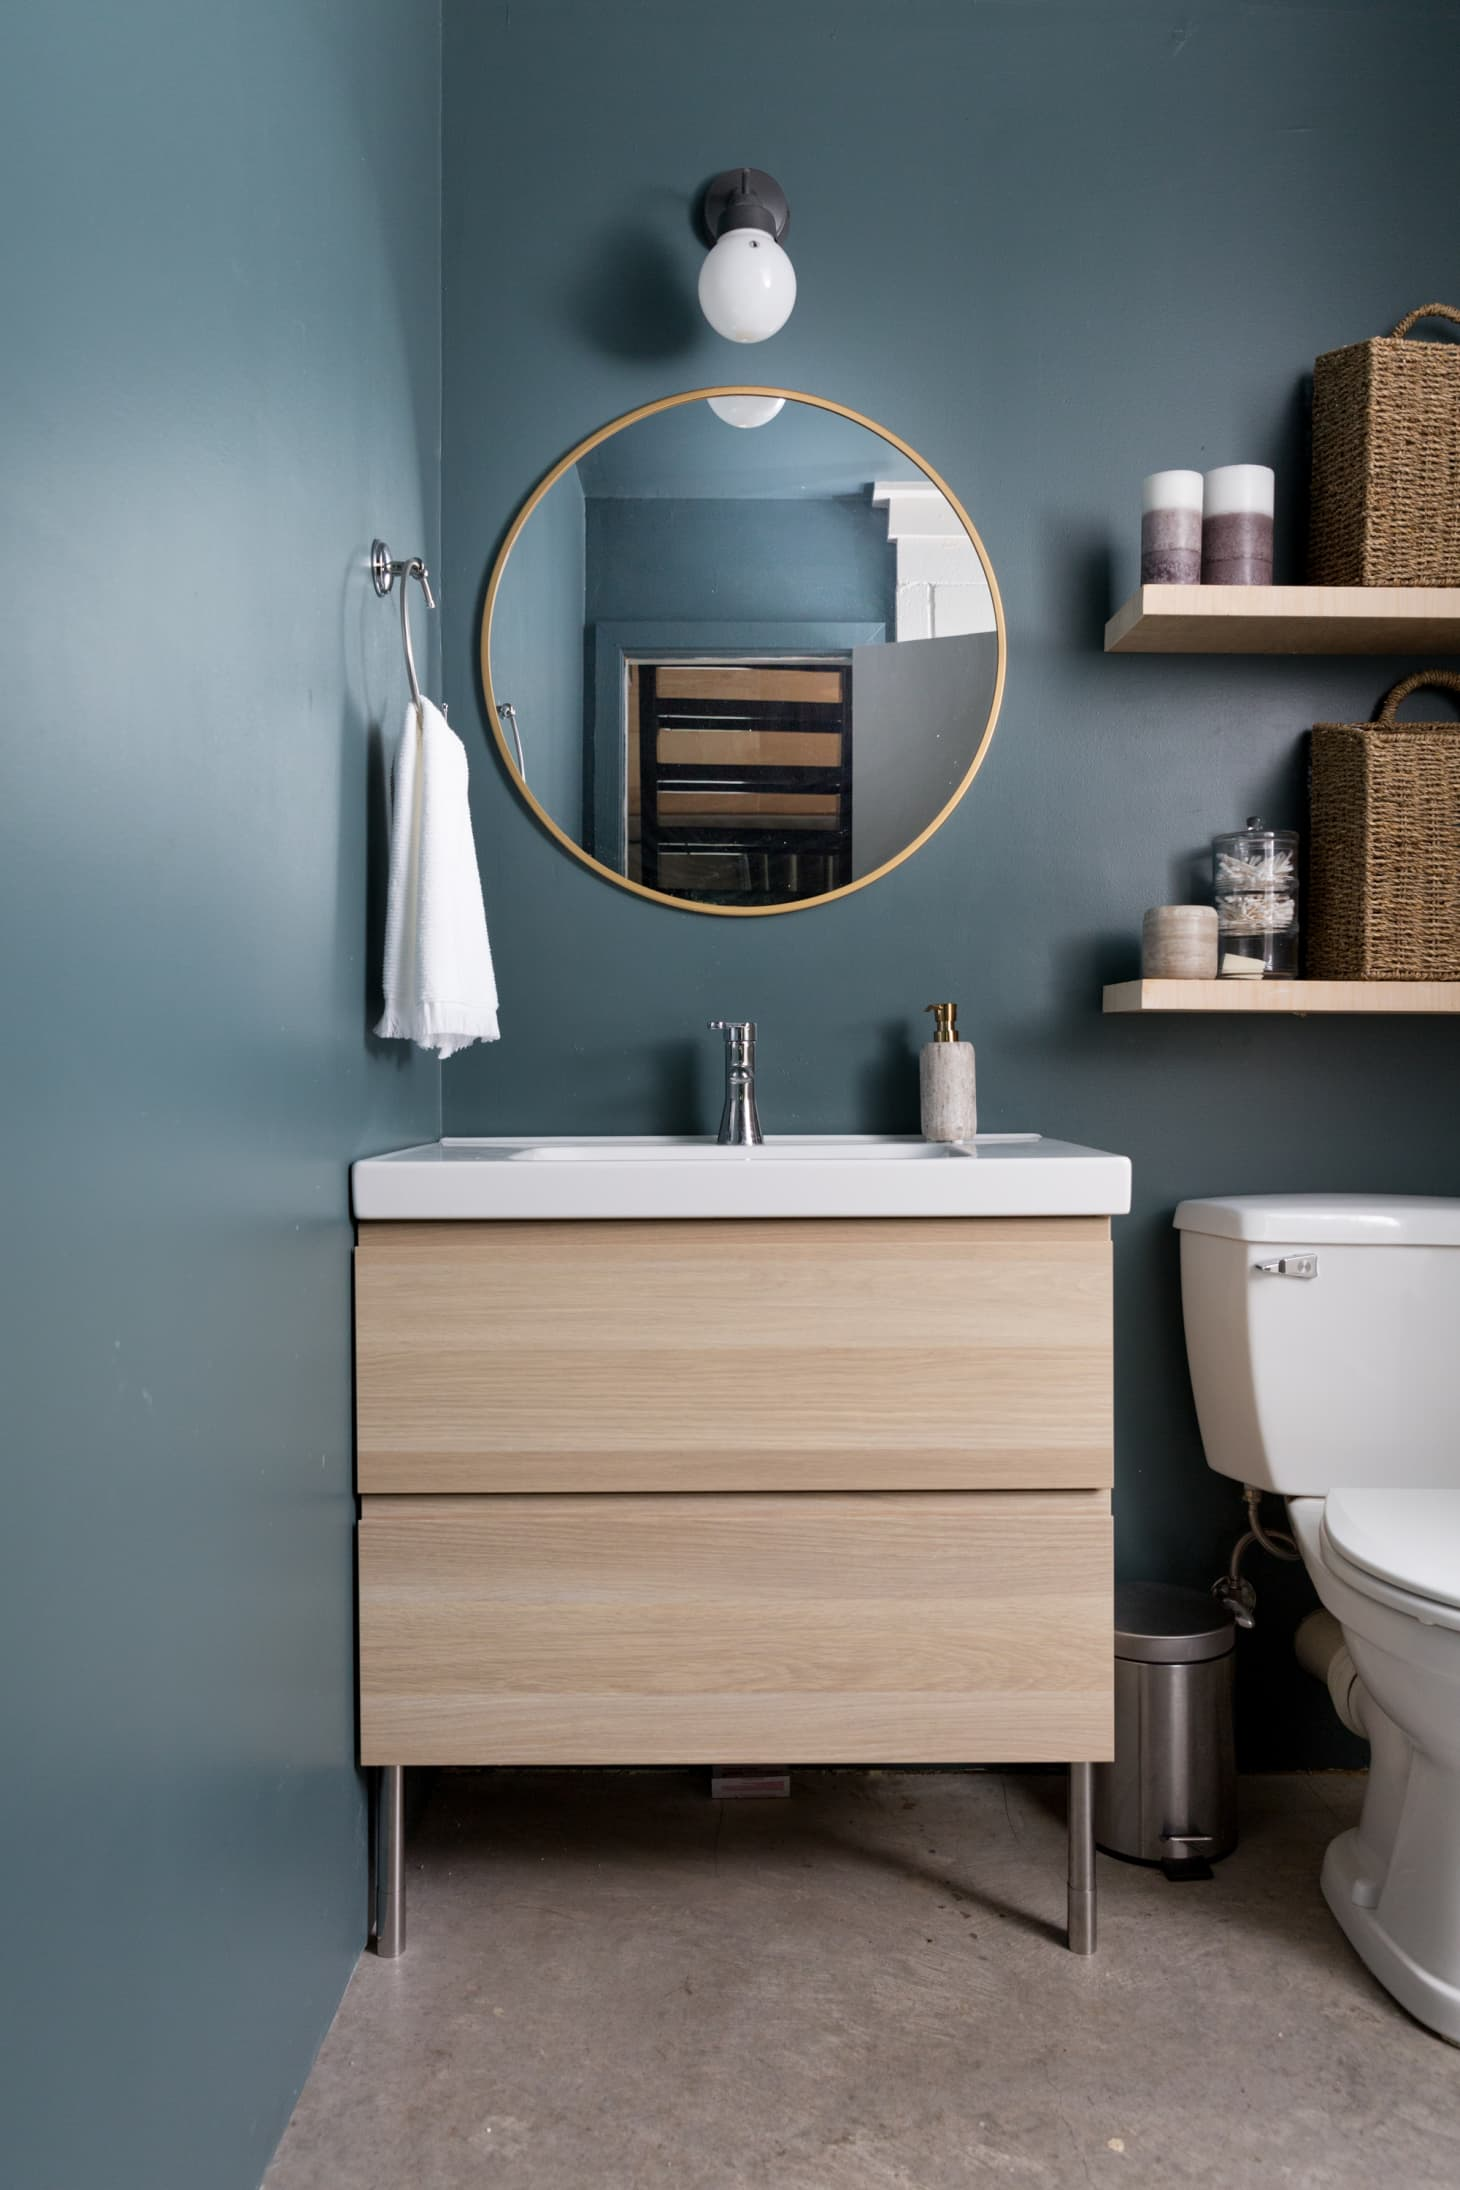 25 Small Bathroom Storage & Design Ideas - Storage ... on Small Apartment Bathroom  id=67403